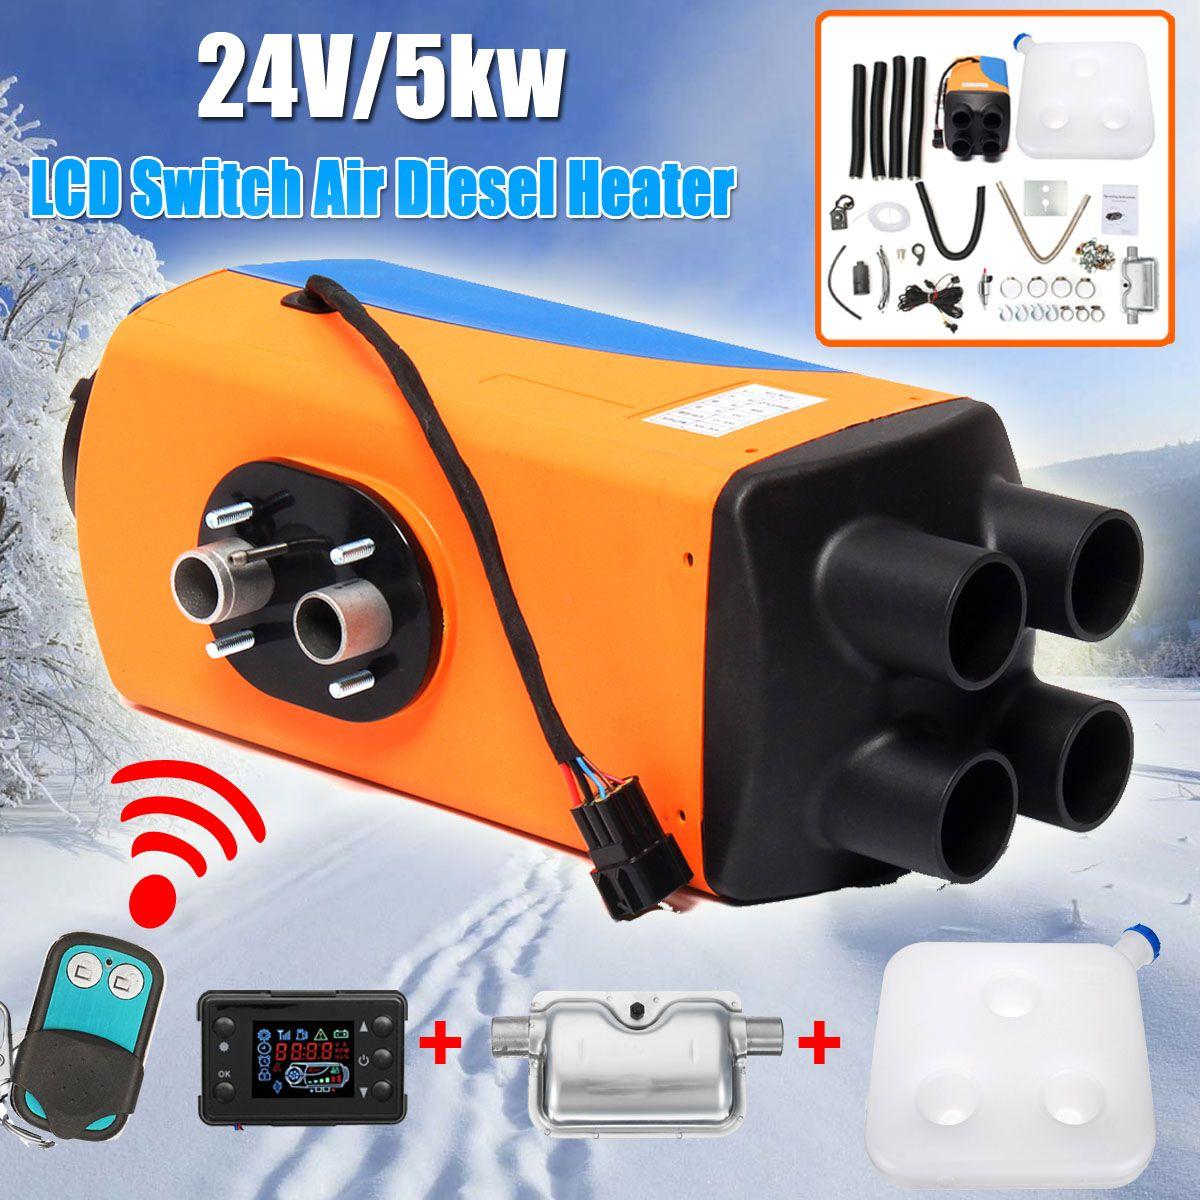 24V Car Heater 5KW Car Parking Air Diesels Fuel Heater 4-Holes 5000W for RV Boats Motorhome Trucks Trailer Car Accessories